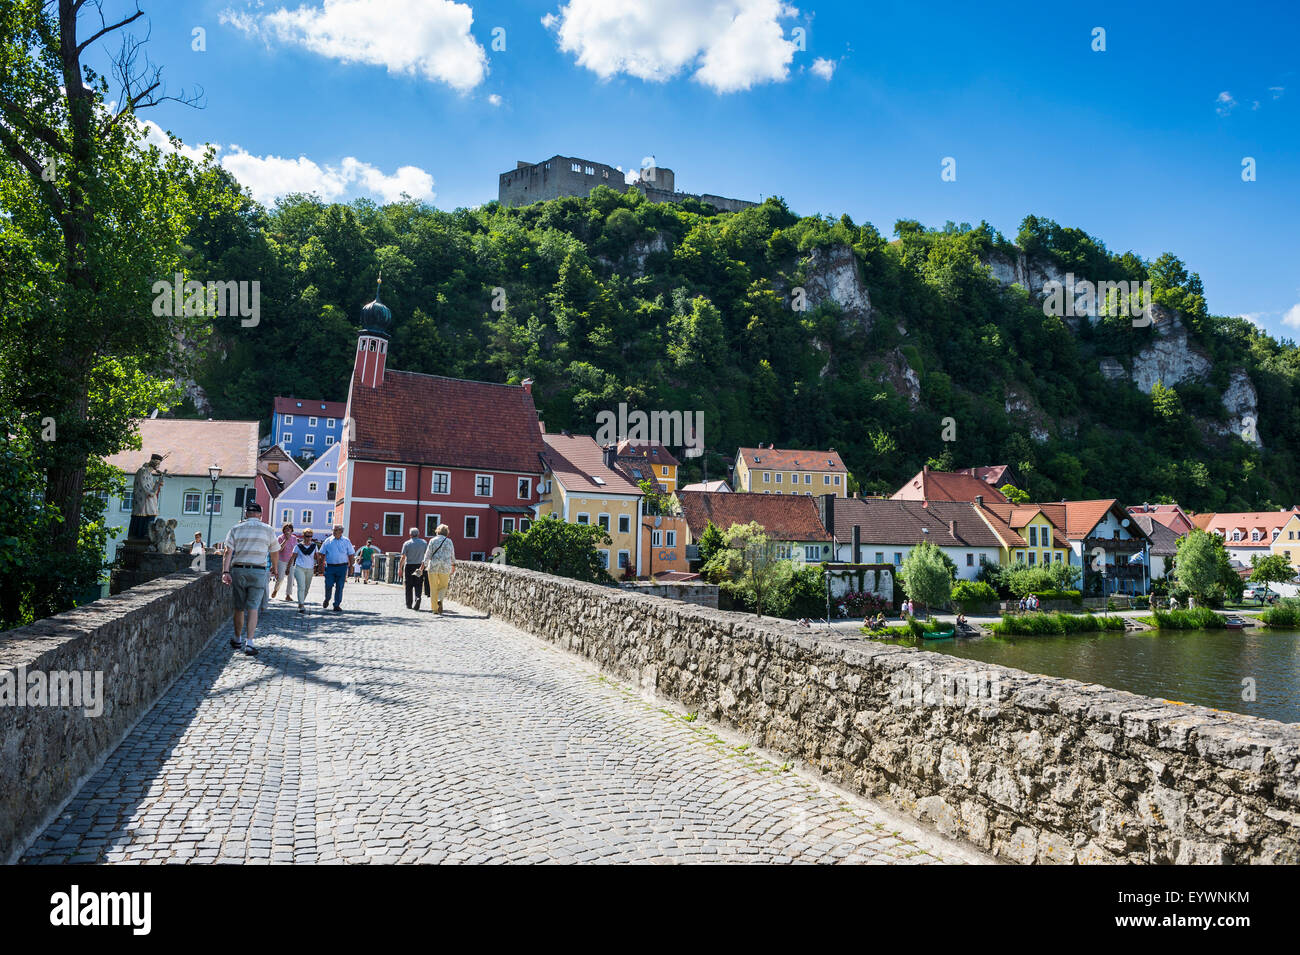 Kallmuenz Castle above medieval houses in the center of Kallmuenz on the Naab, Bavaria, Germany, Europe - Stock Image